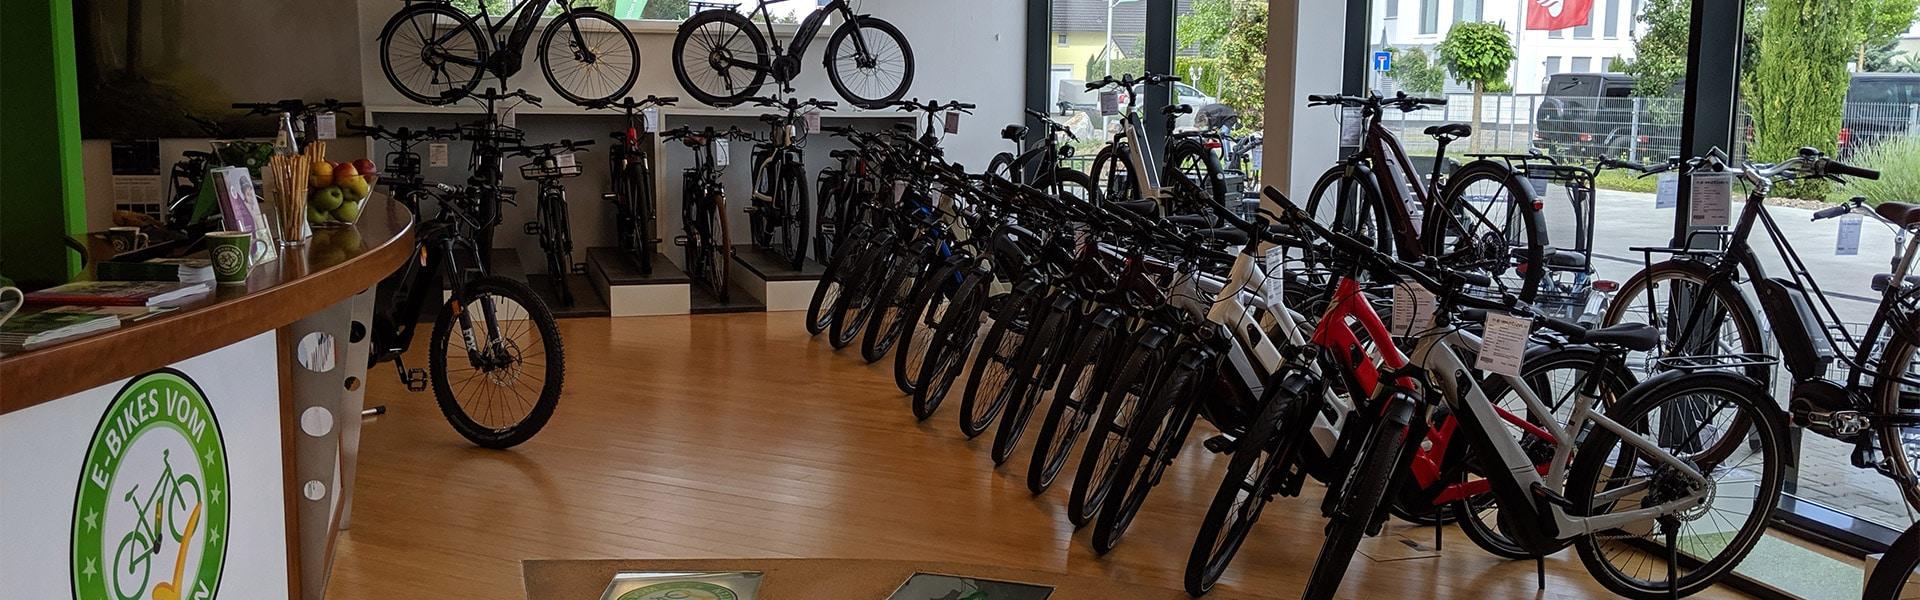 Der Shop der e-motion e-Bike Welt Freiburg Süd